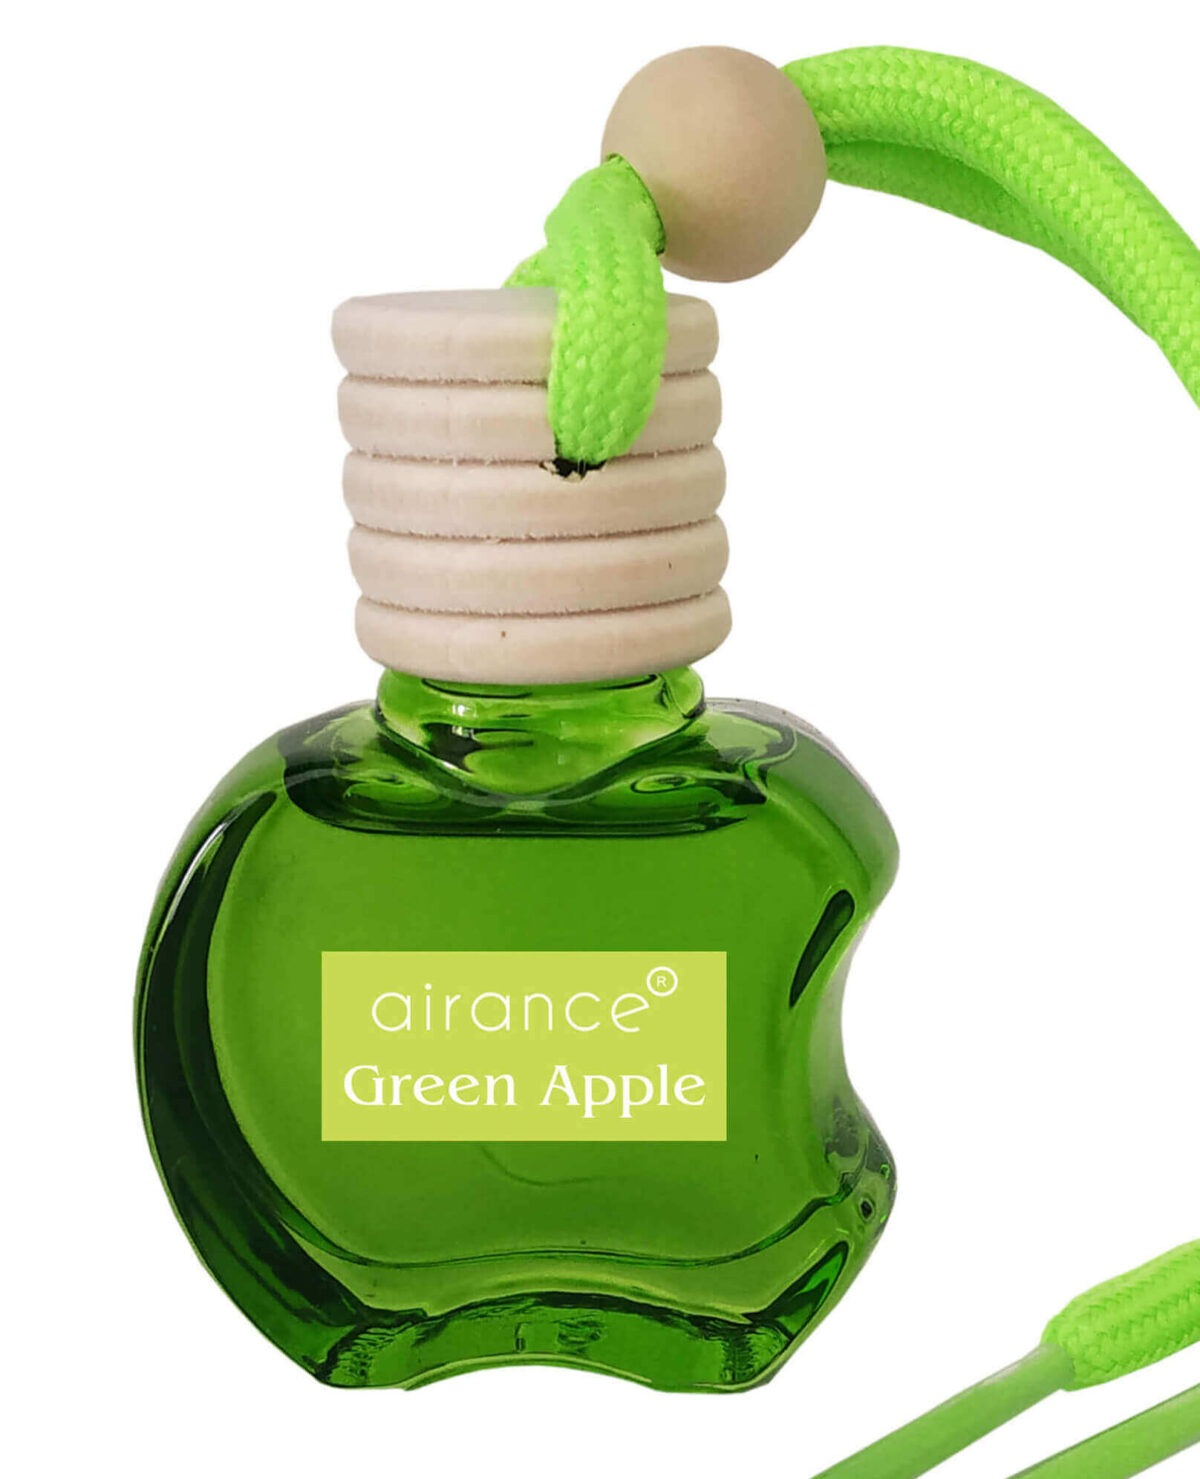 Airance Car Air Freshener Hanging - Green Apple